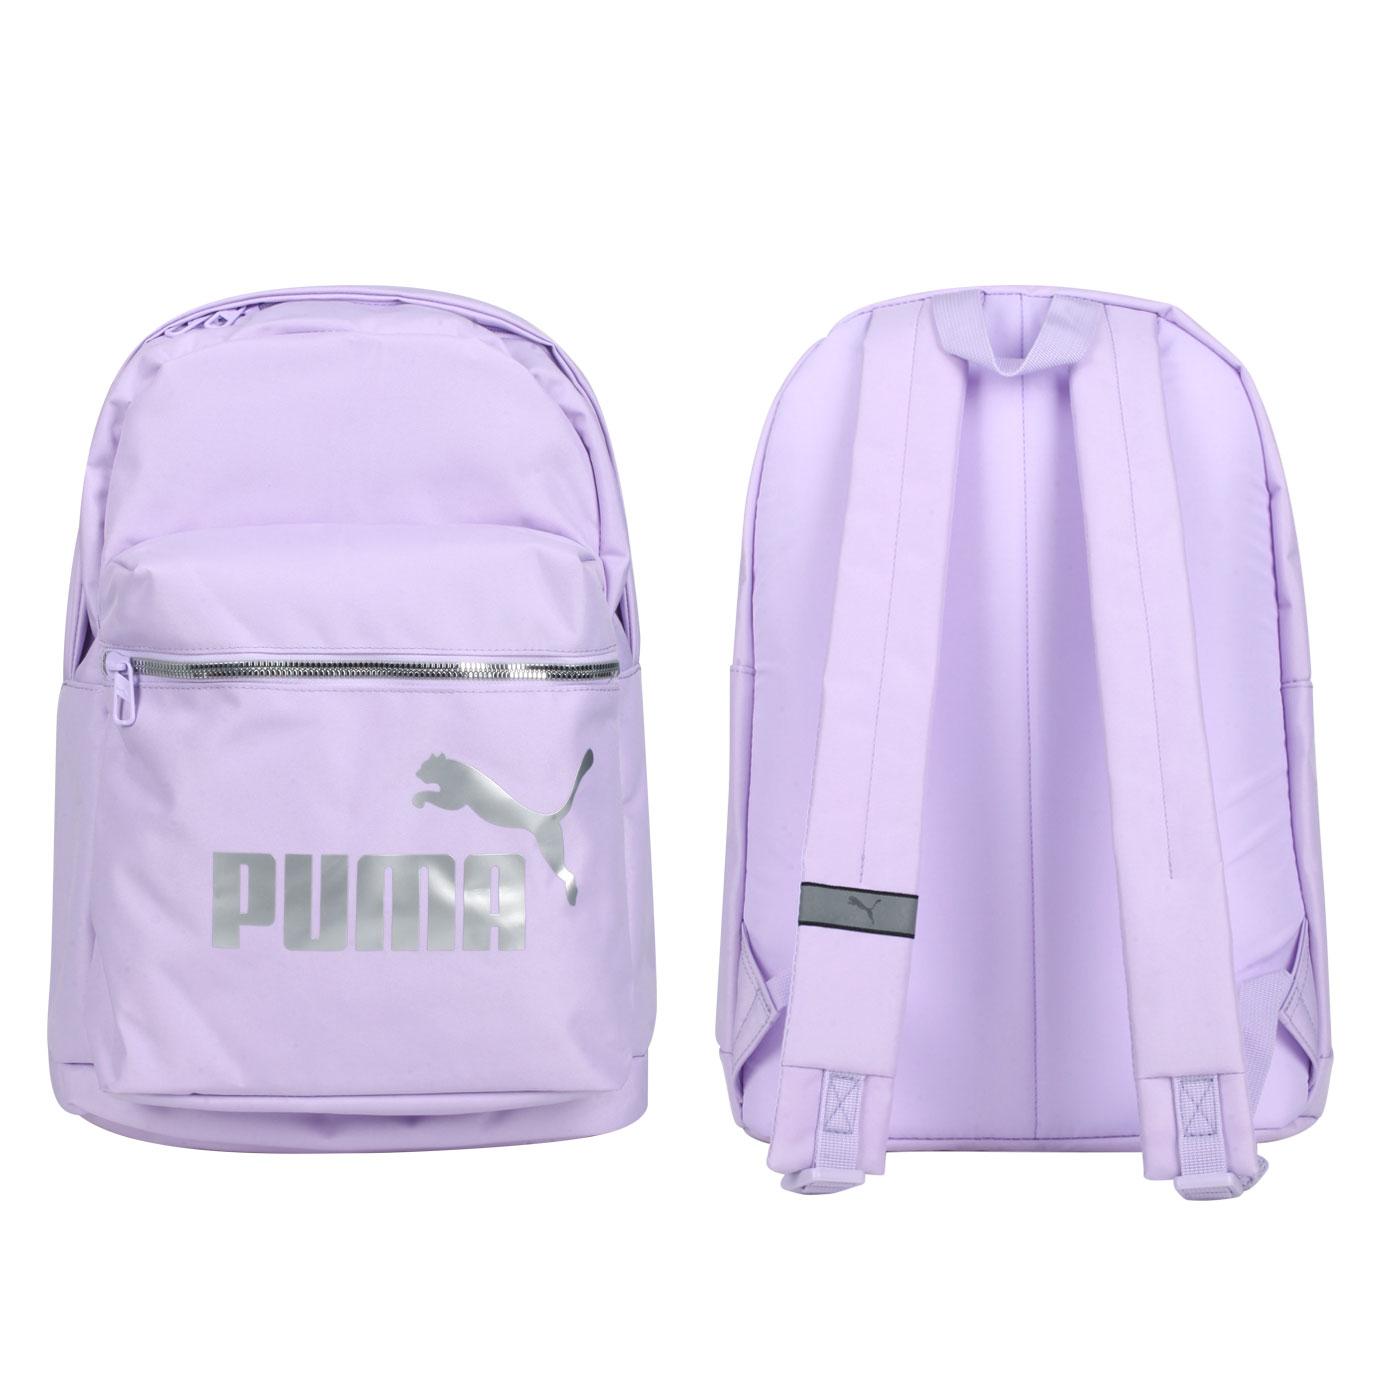 PUMA 後背包 07815007 - 紫銀